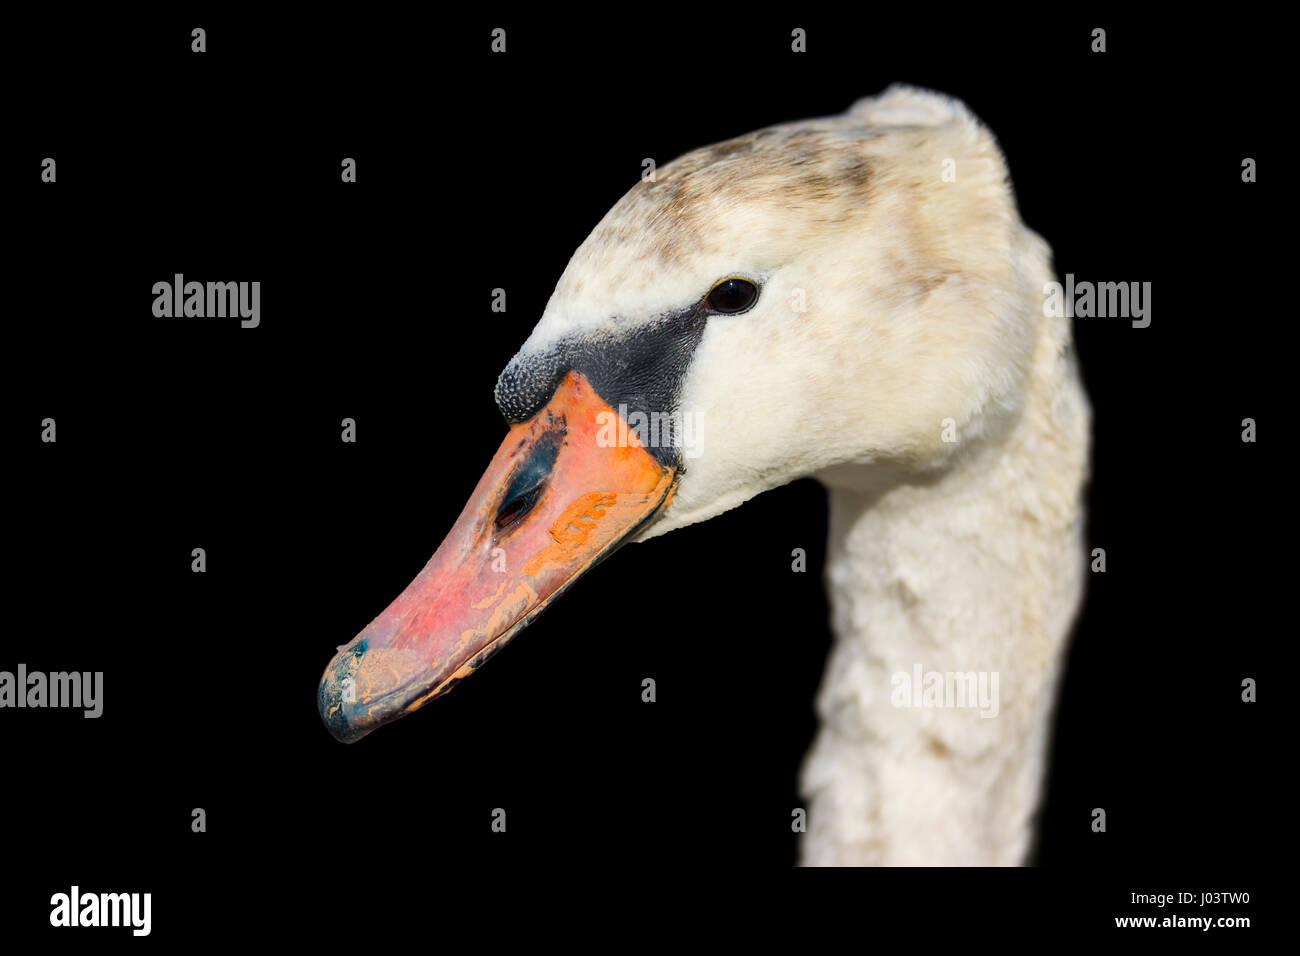 closeup-head-of-a-white-mute-swan-cygnus